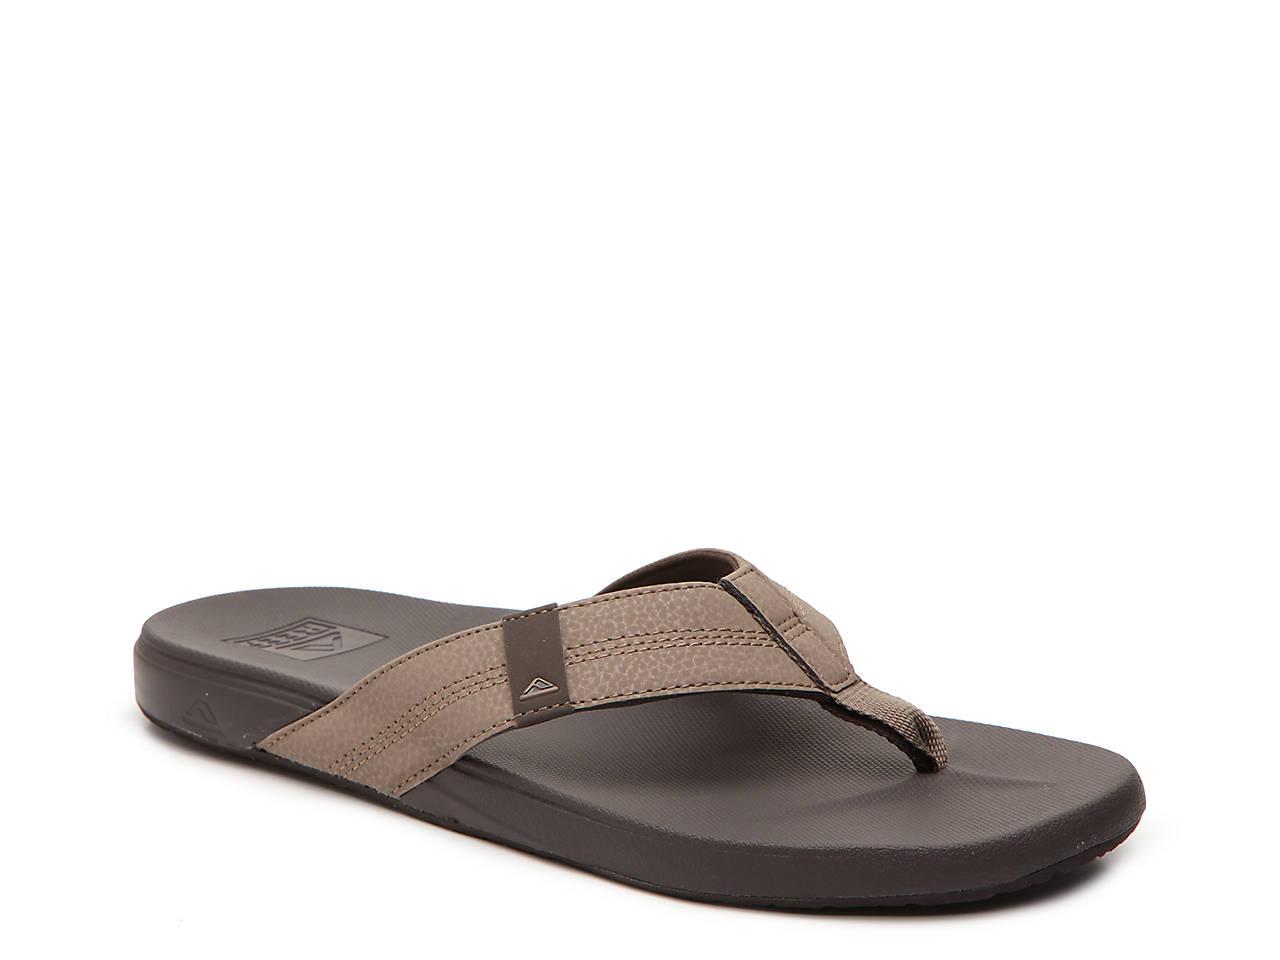 472e4037 Reef Cushion Bounce Phantom Flip Flop Men's Shoes | DSW